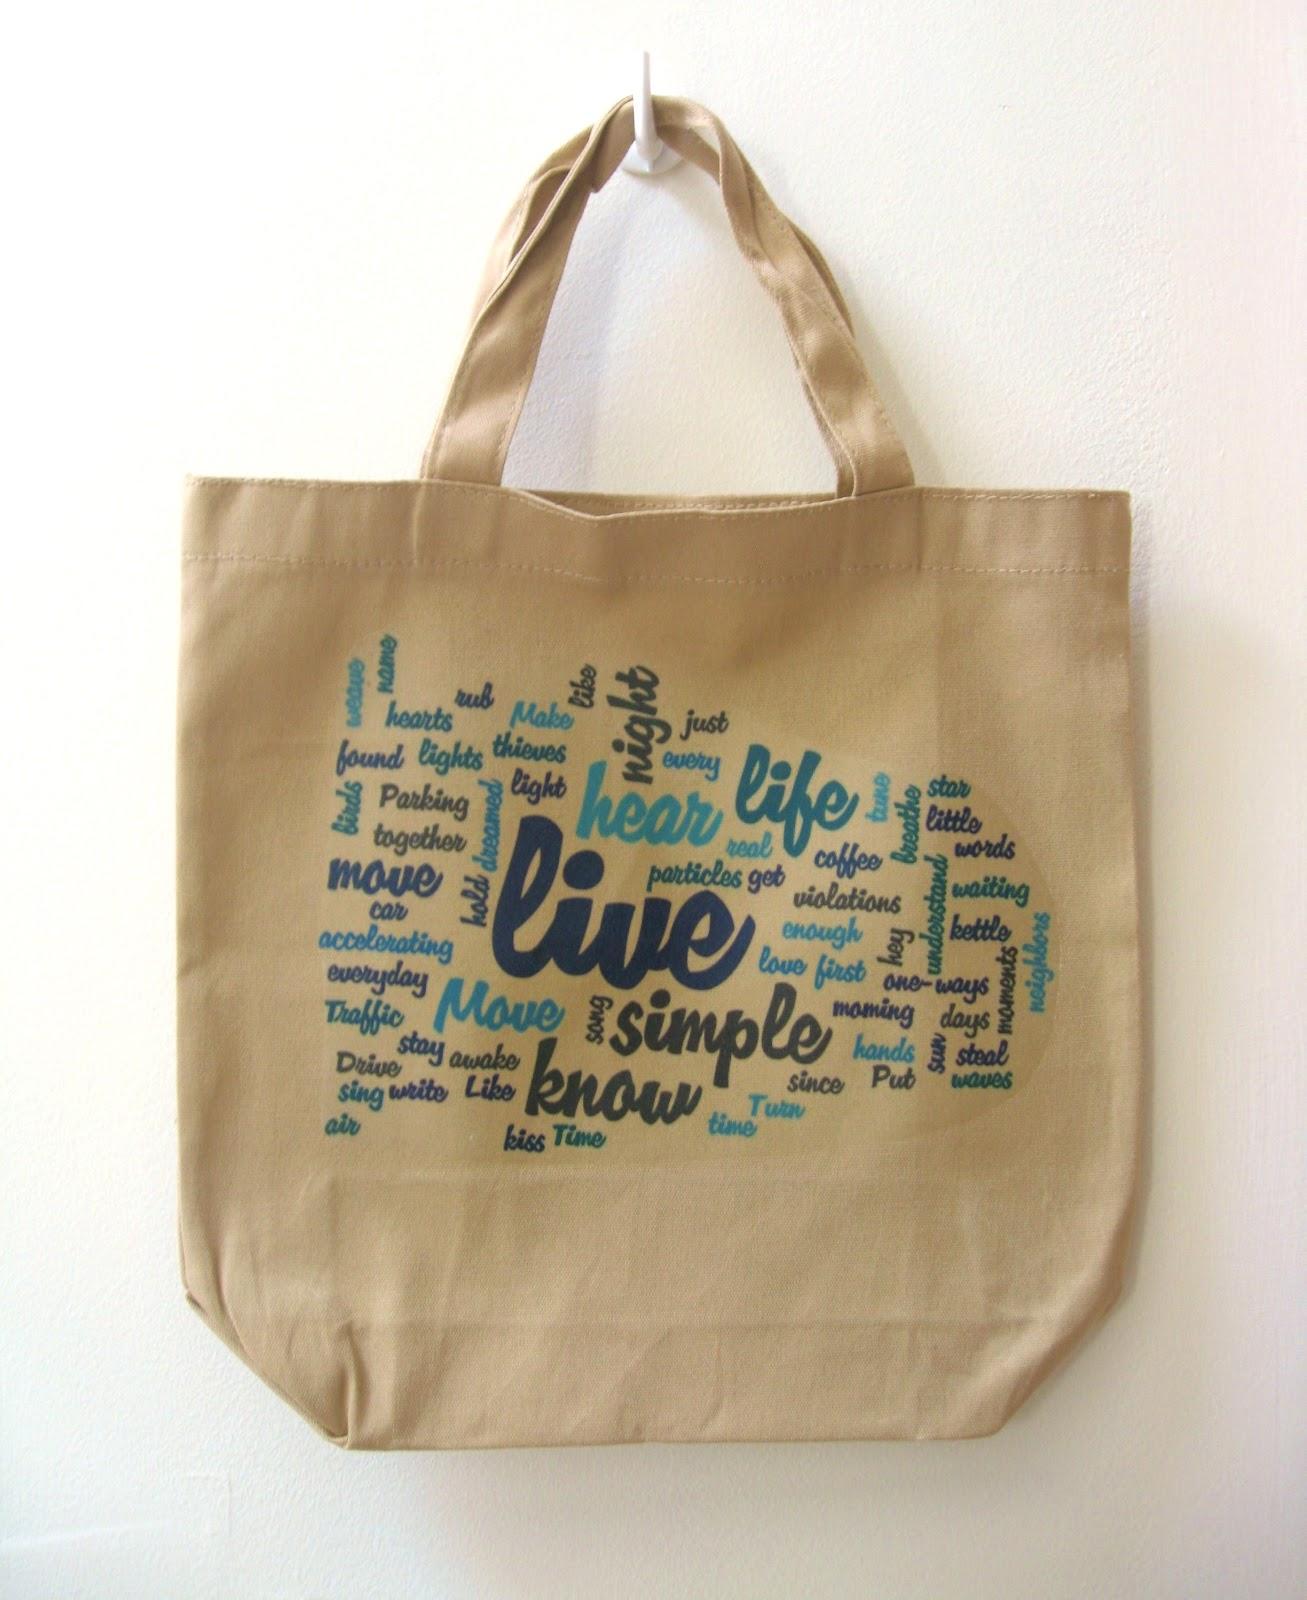 megan E sass handknits: DIY Word Cloud Tote Bag: How-To